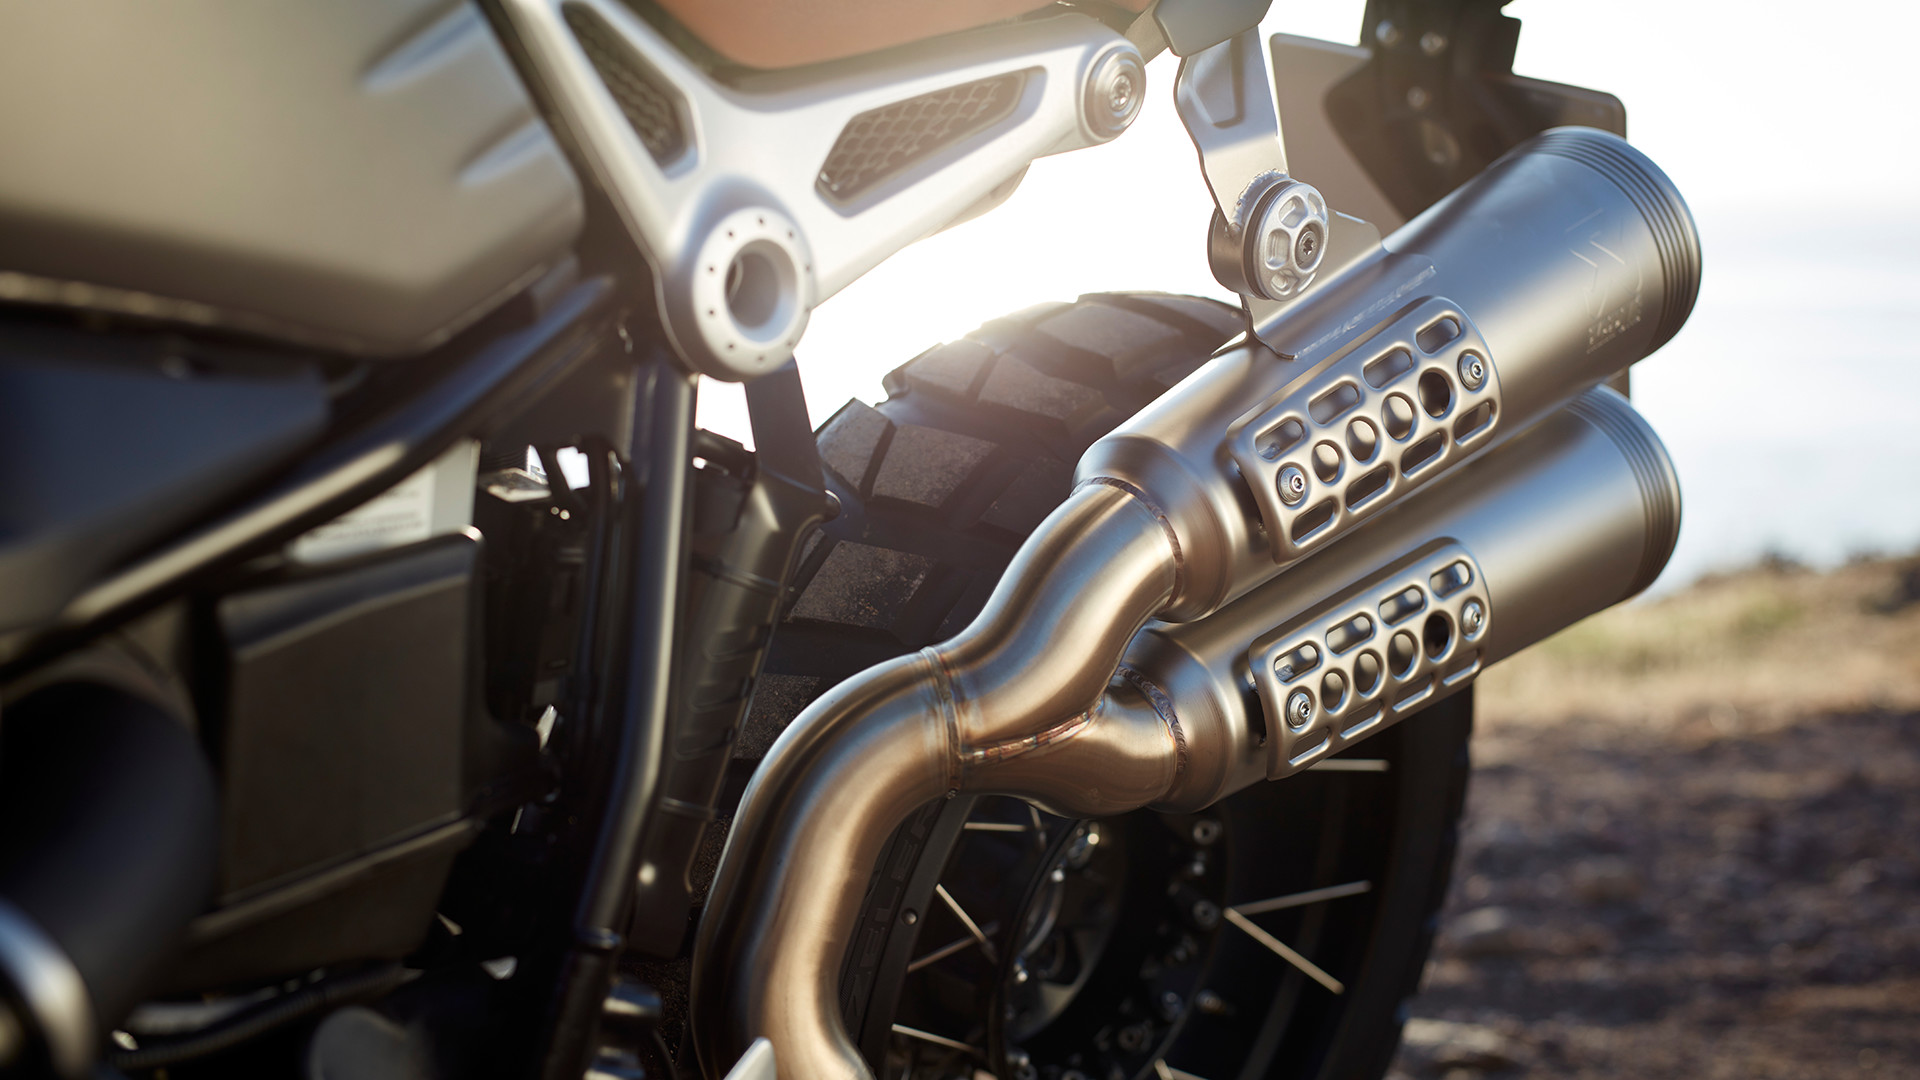 R ninet Scrambler | BMW Motorcycles of Riverside California